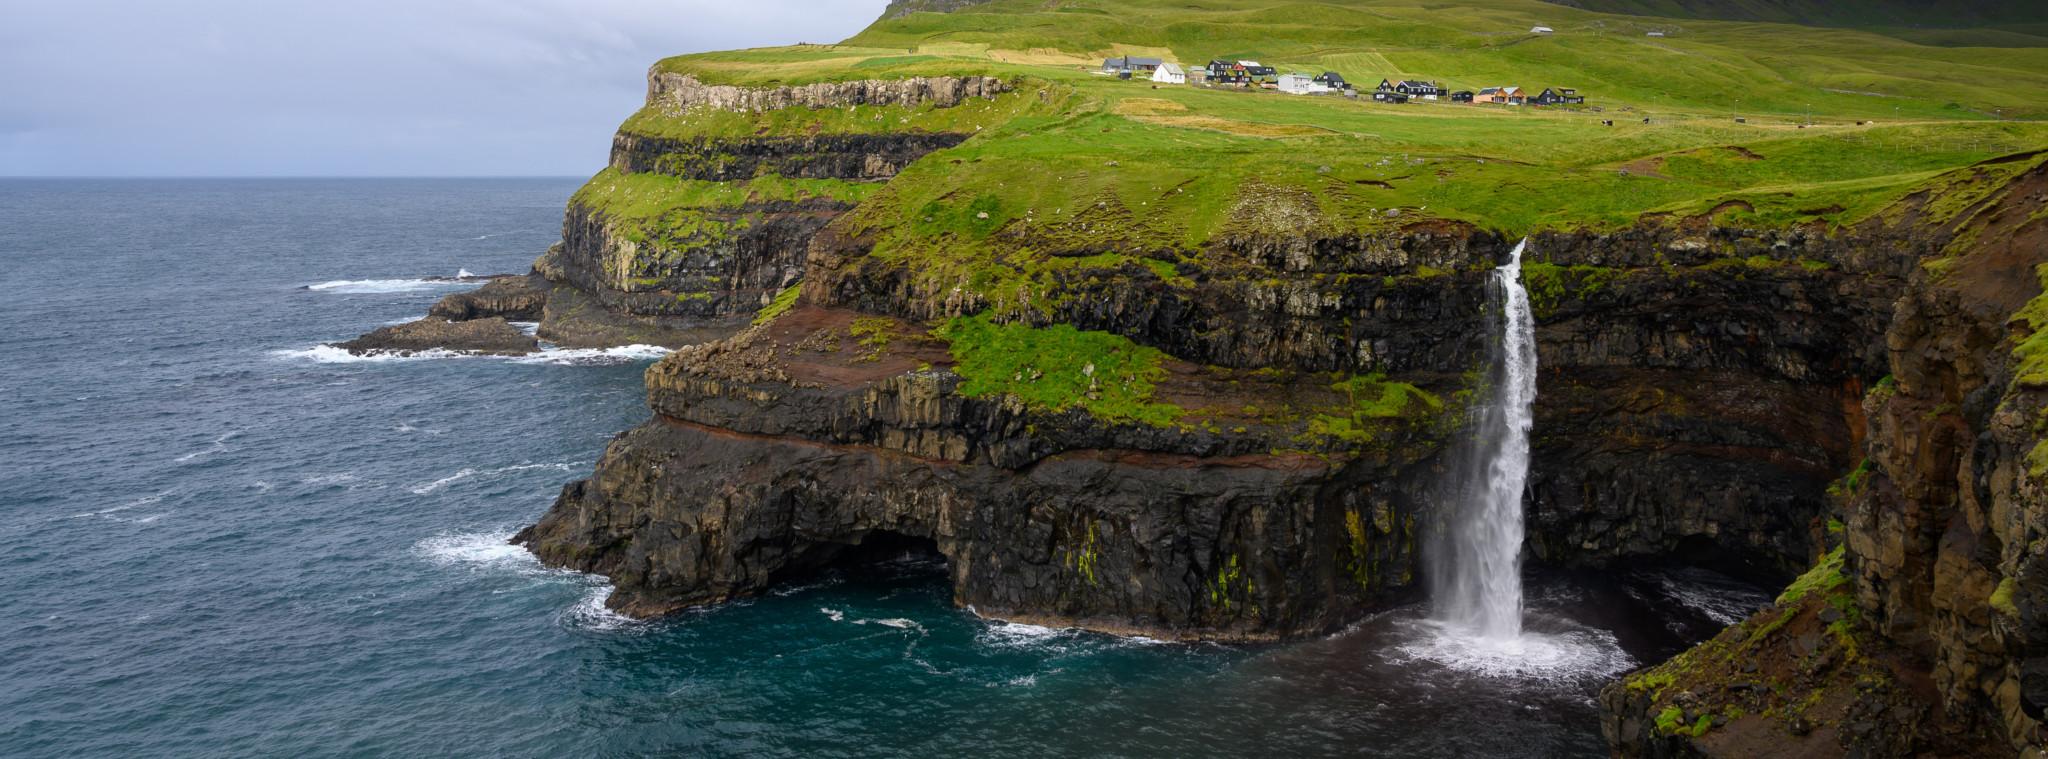 Gasadalur Wasserfall Färöer Inseln